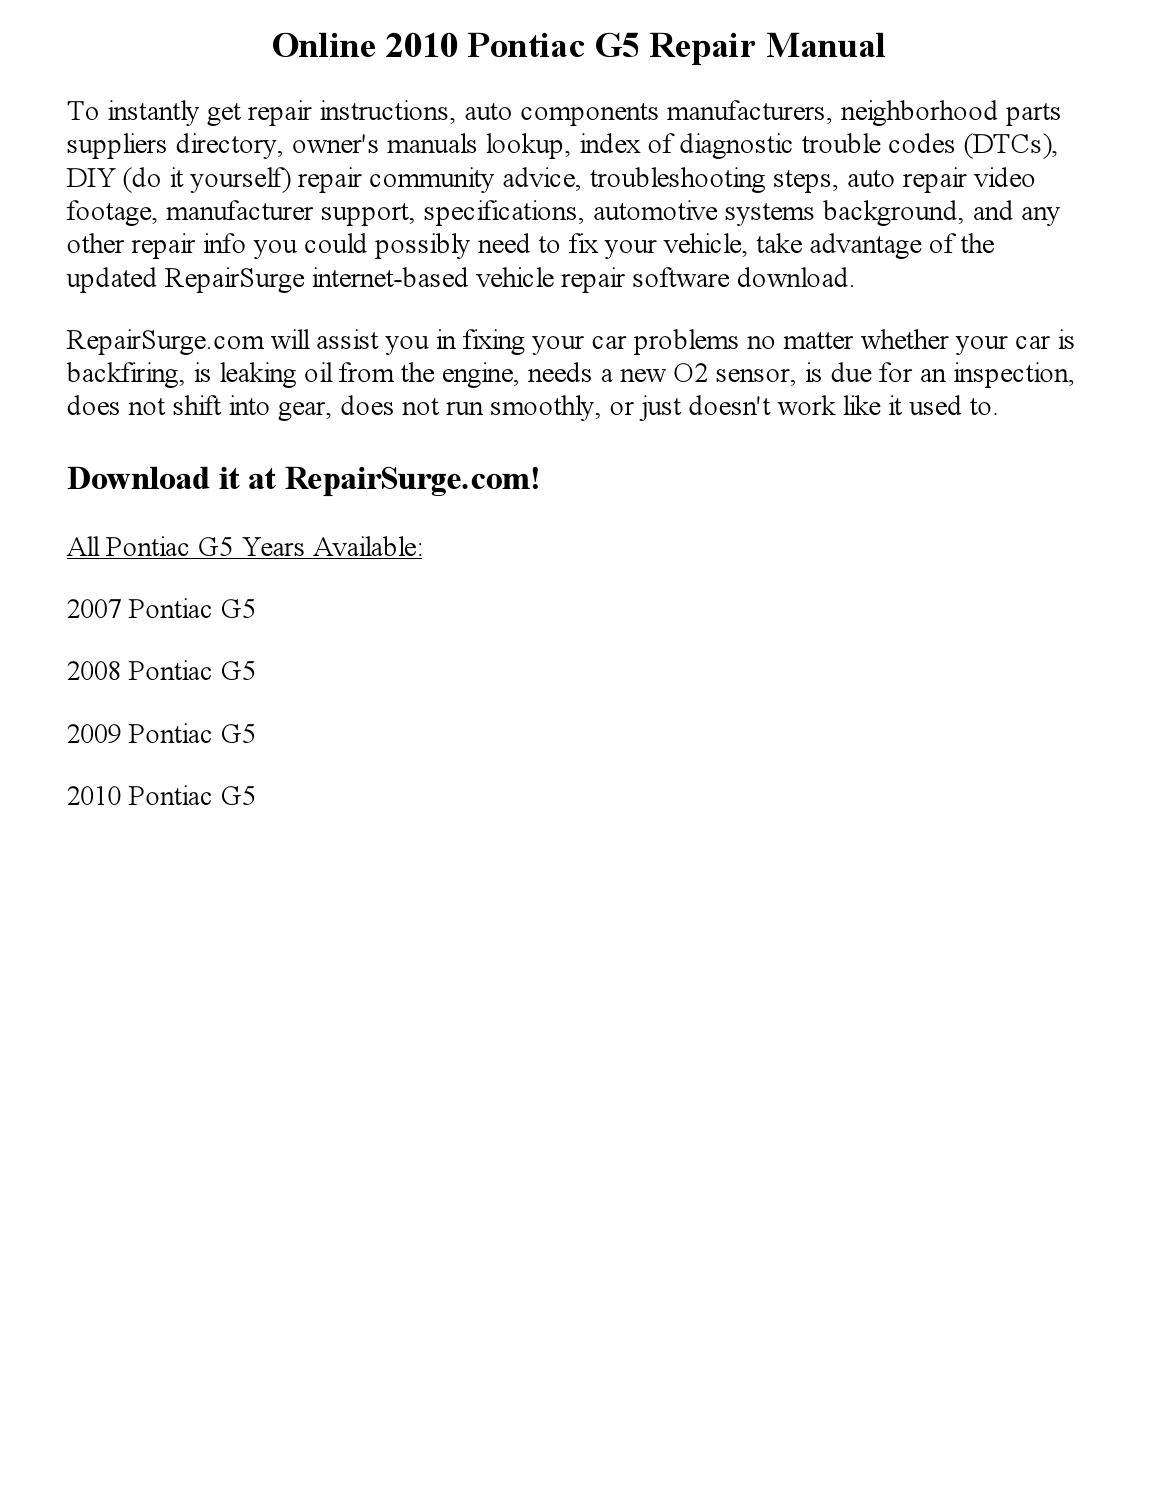 2010 pontiac g5 repair manual online by partgeorge issuu solutioingenieria Choice Image